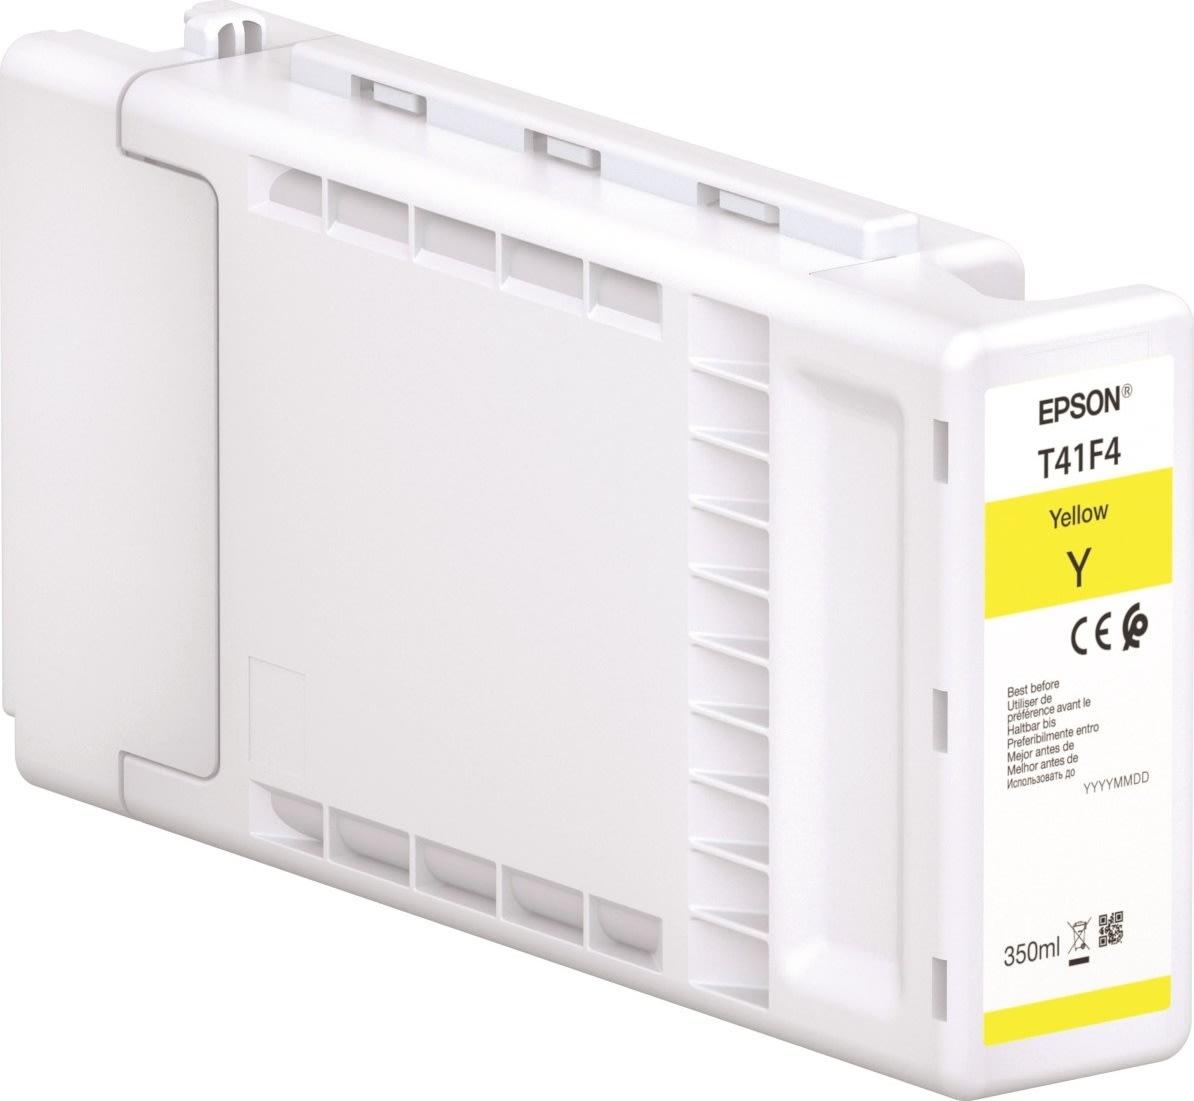 Epson XD2 T41F440 blækpatron, gul, 350ml